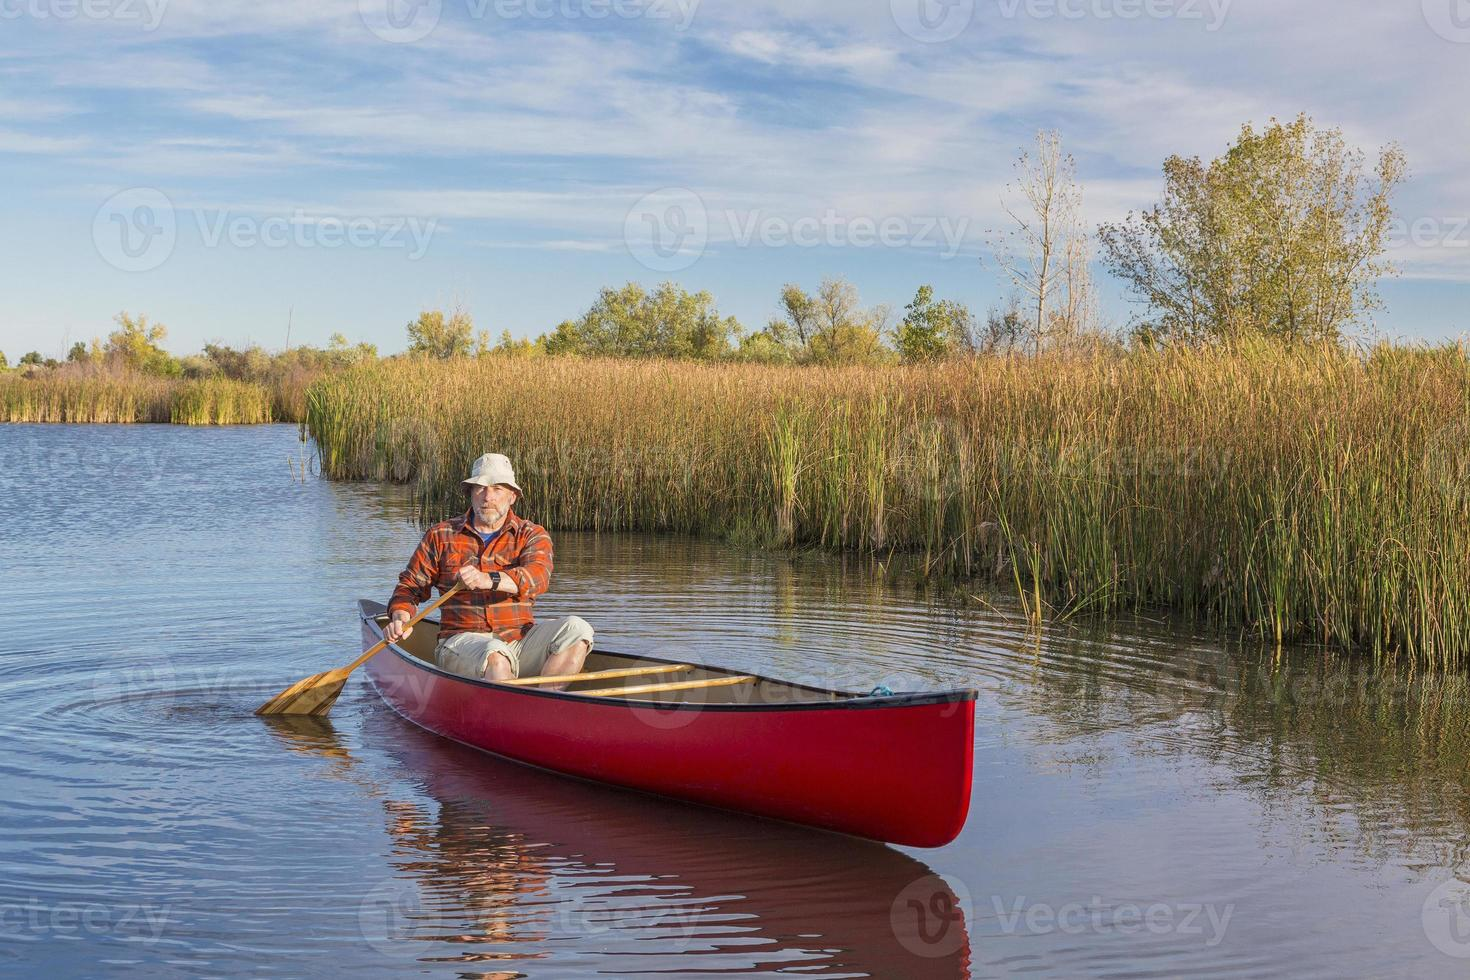 canoa pomeridiana per bambini foto